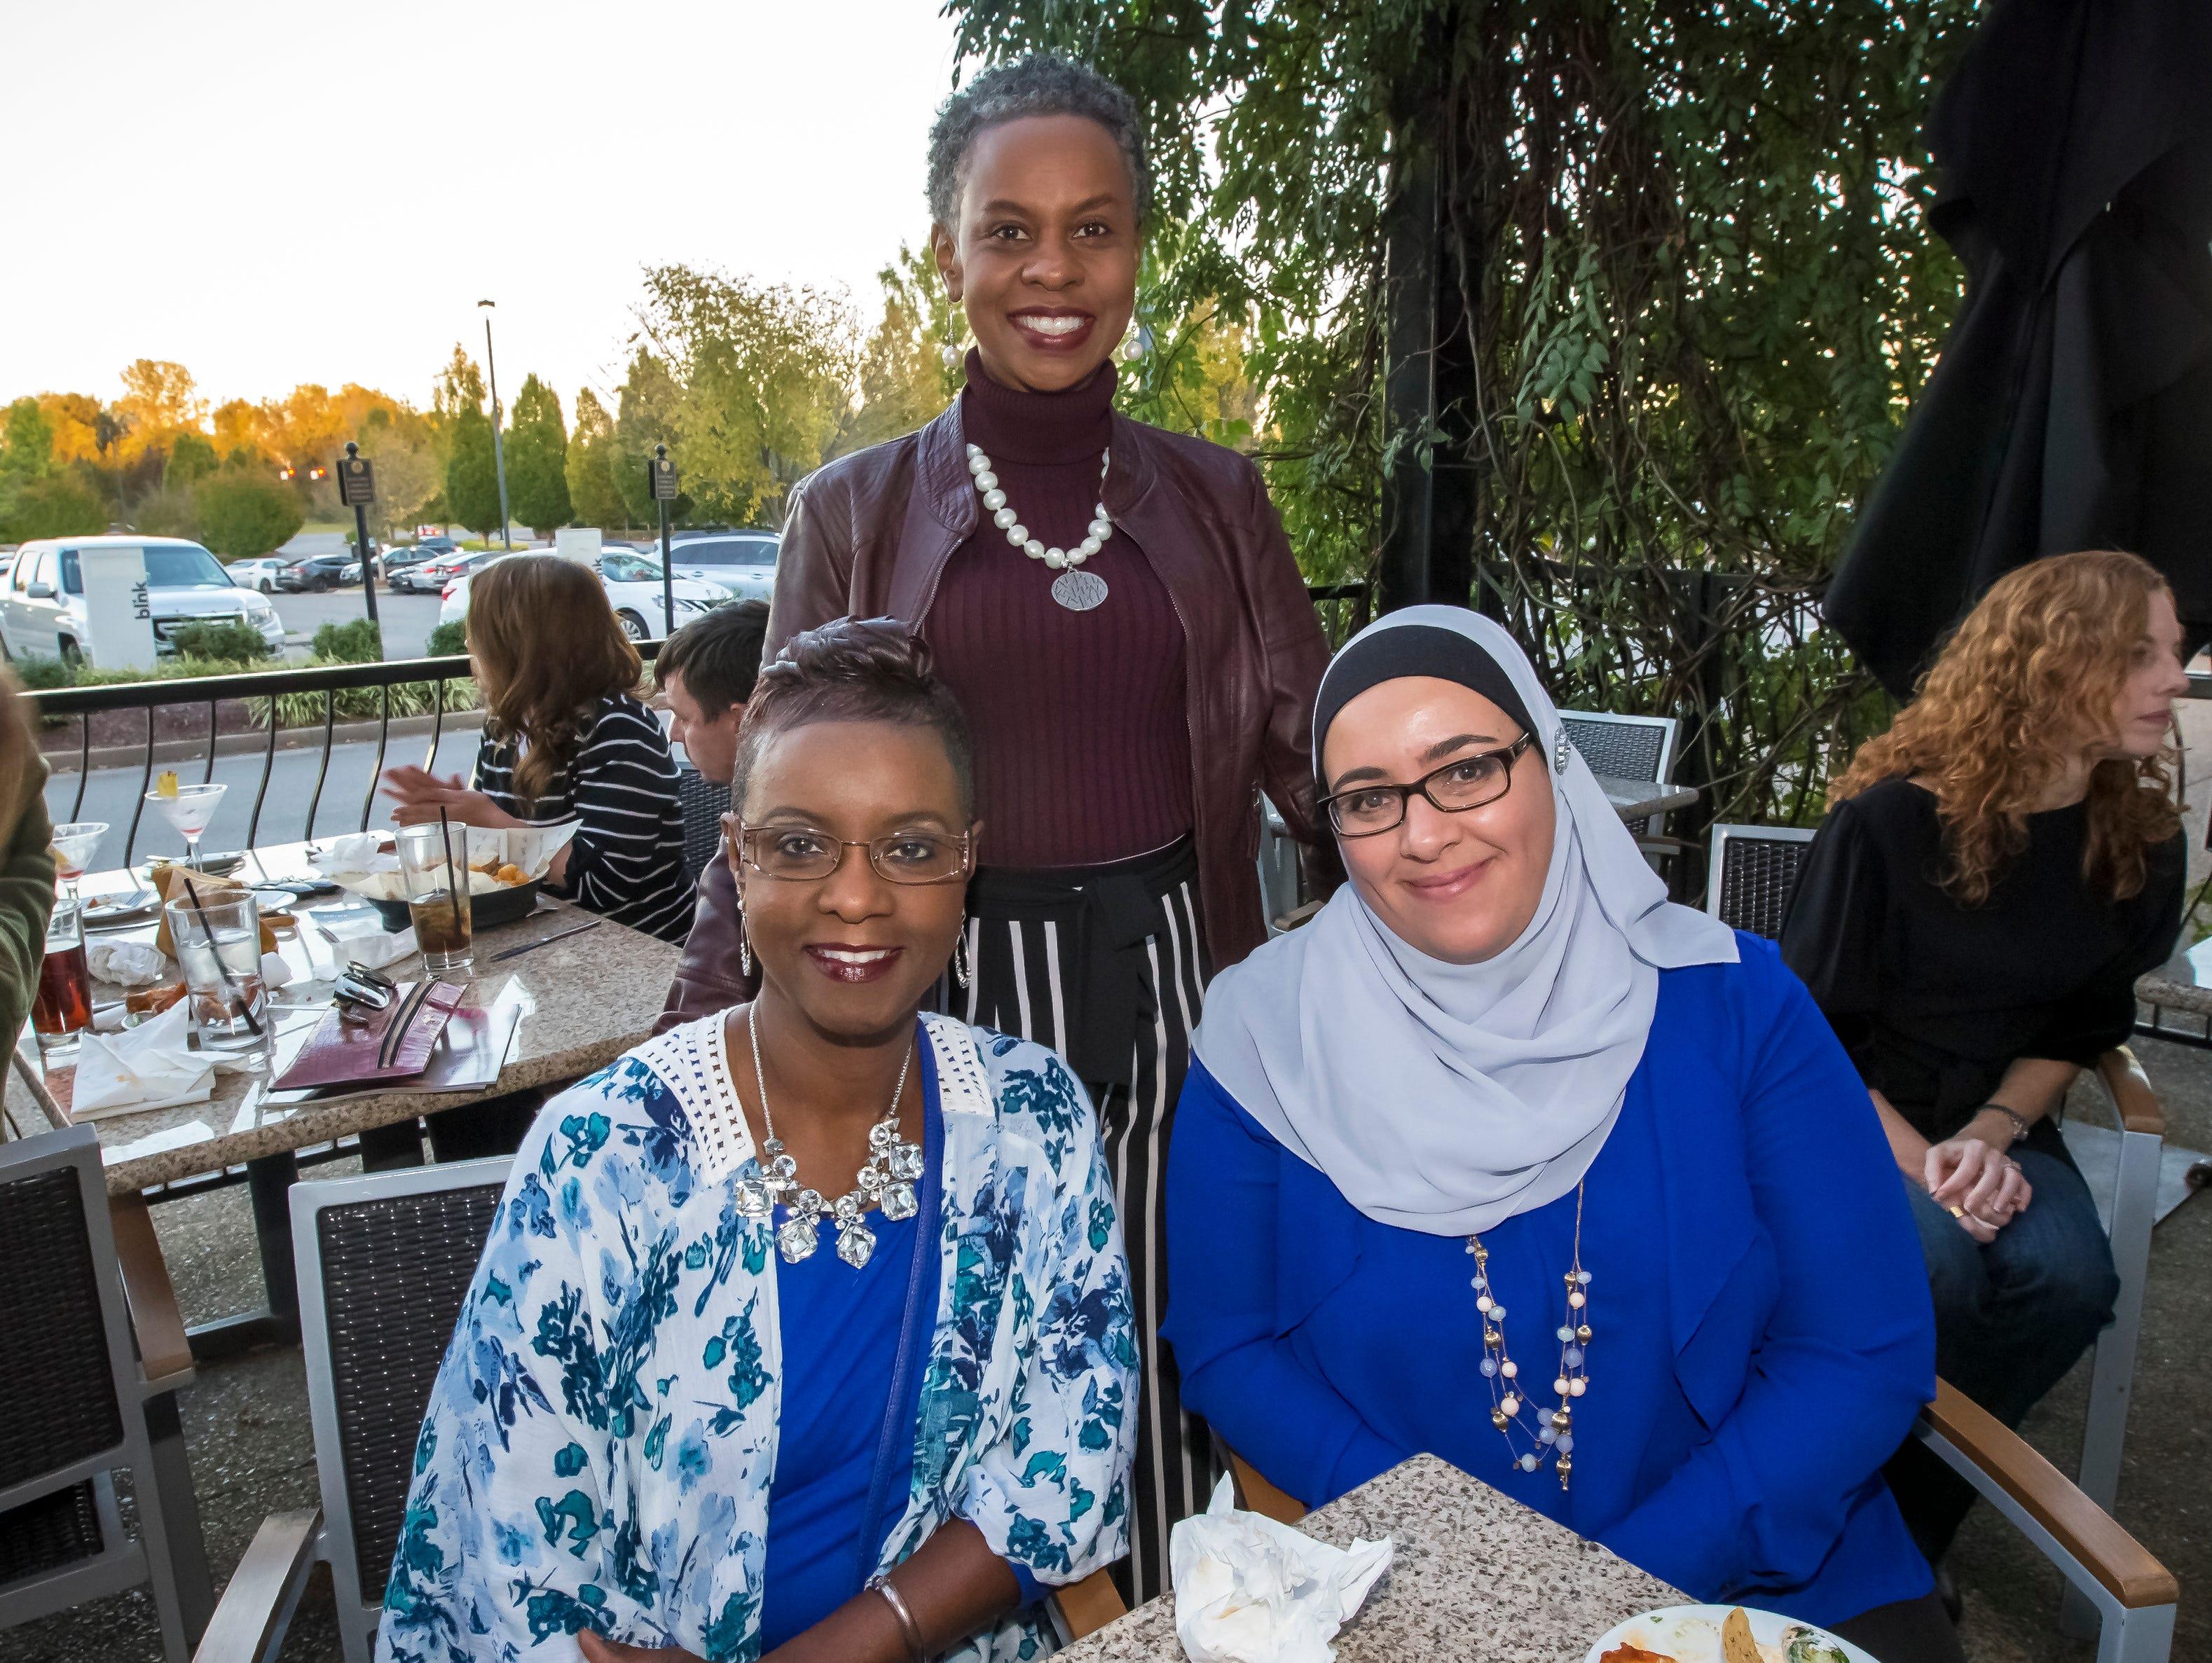 Kezlyn Sellars, Kreda Yokley and Kiba Kattih at the Murfreesboro Magazine Most Beautiful People event held at Bar Louie.